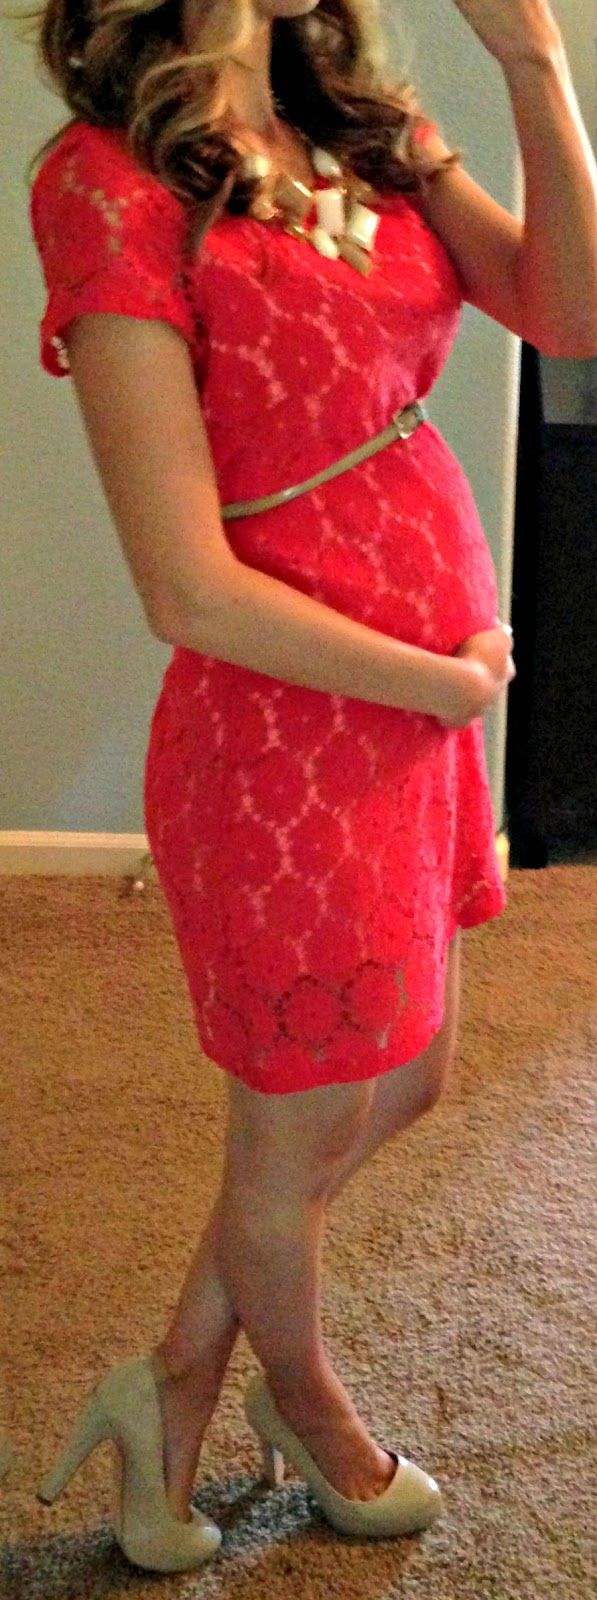 Katie's Closet, maternity fashion, pregnancy style, maternity style, pregnancy fashion